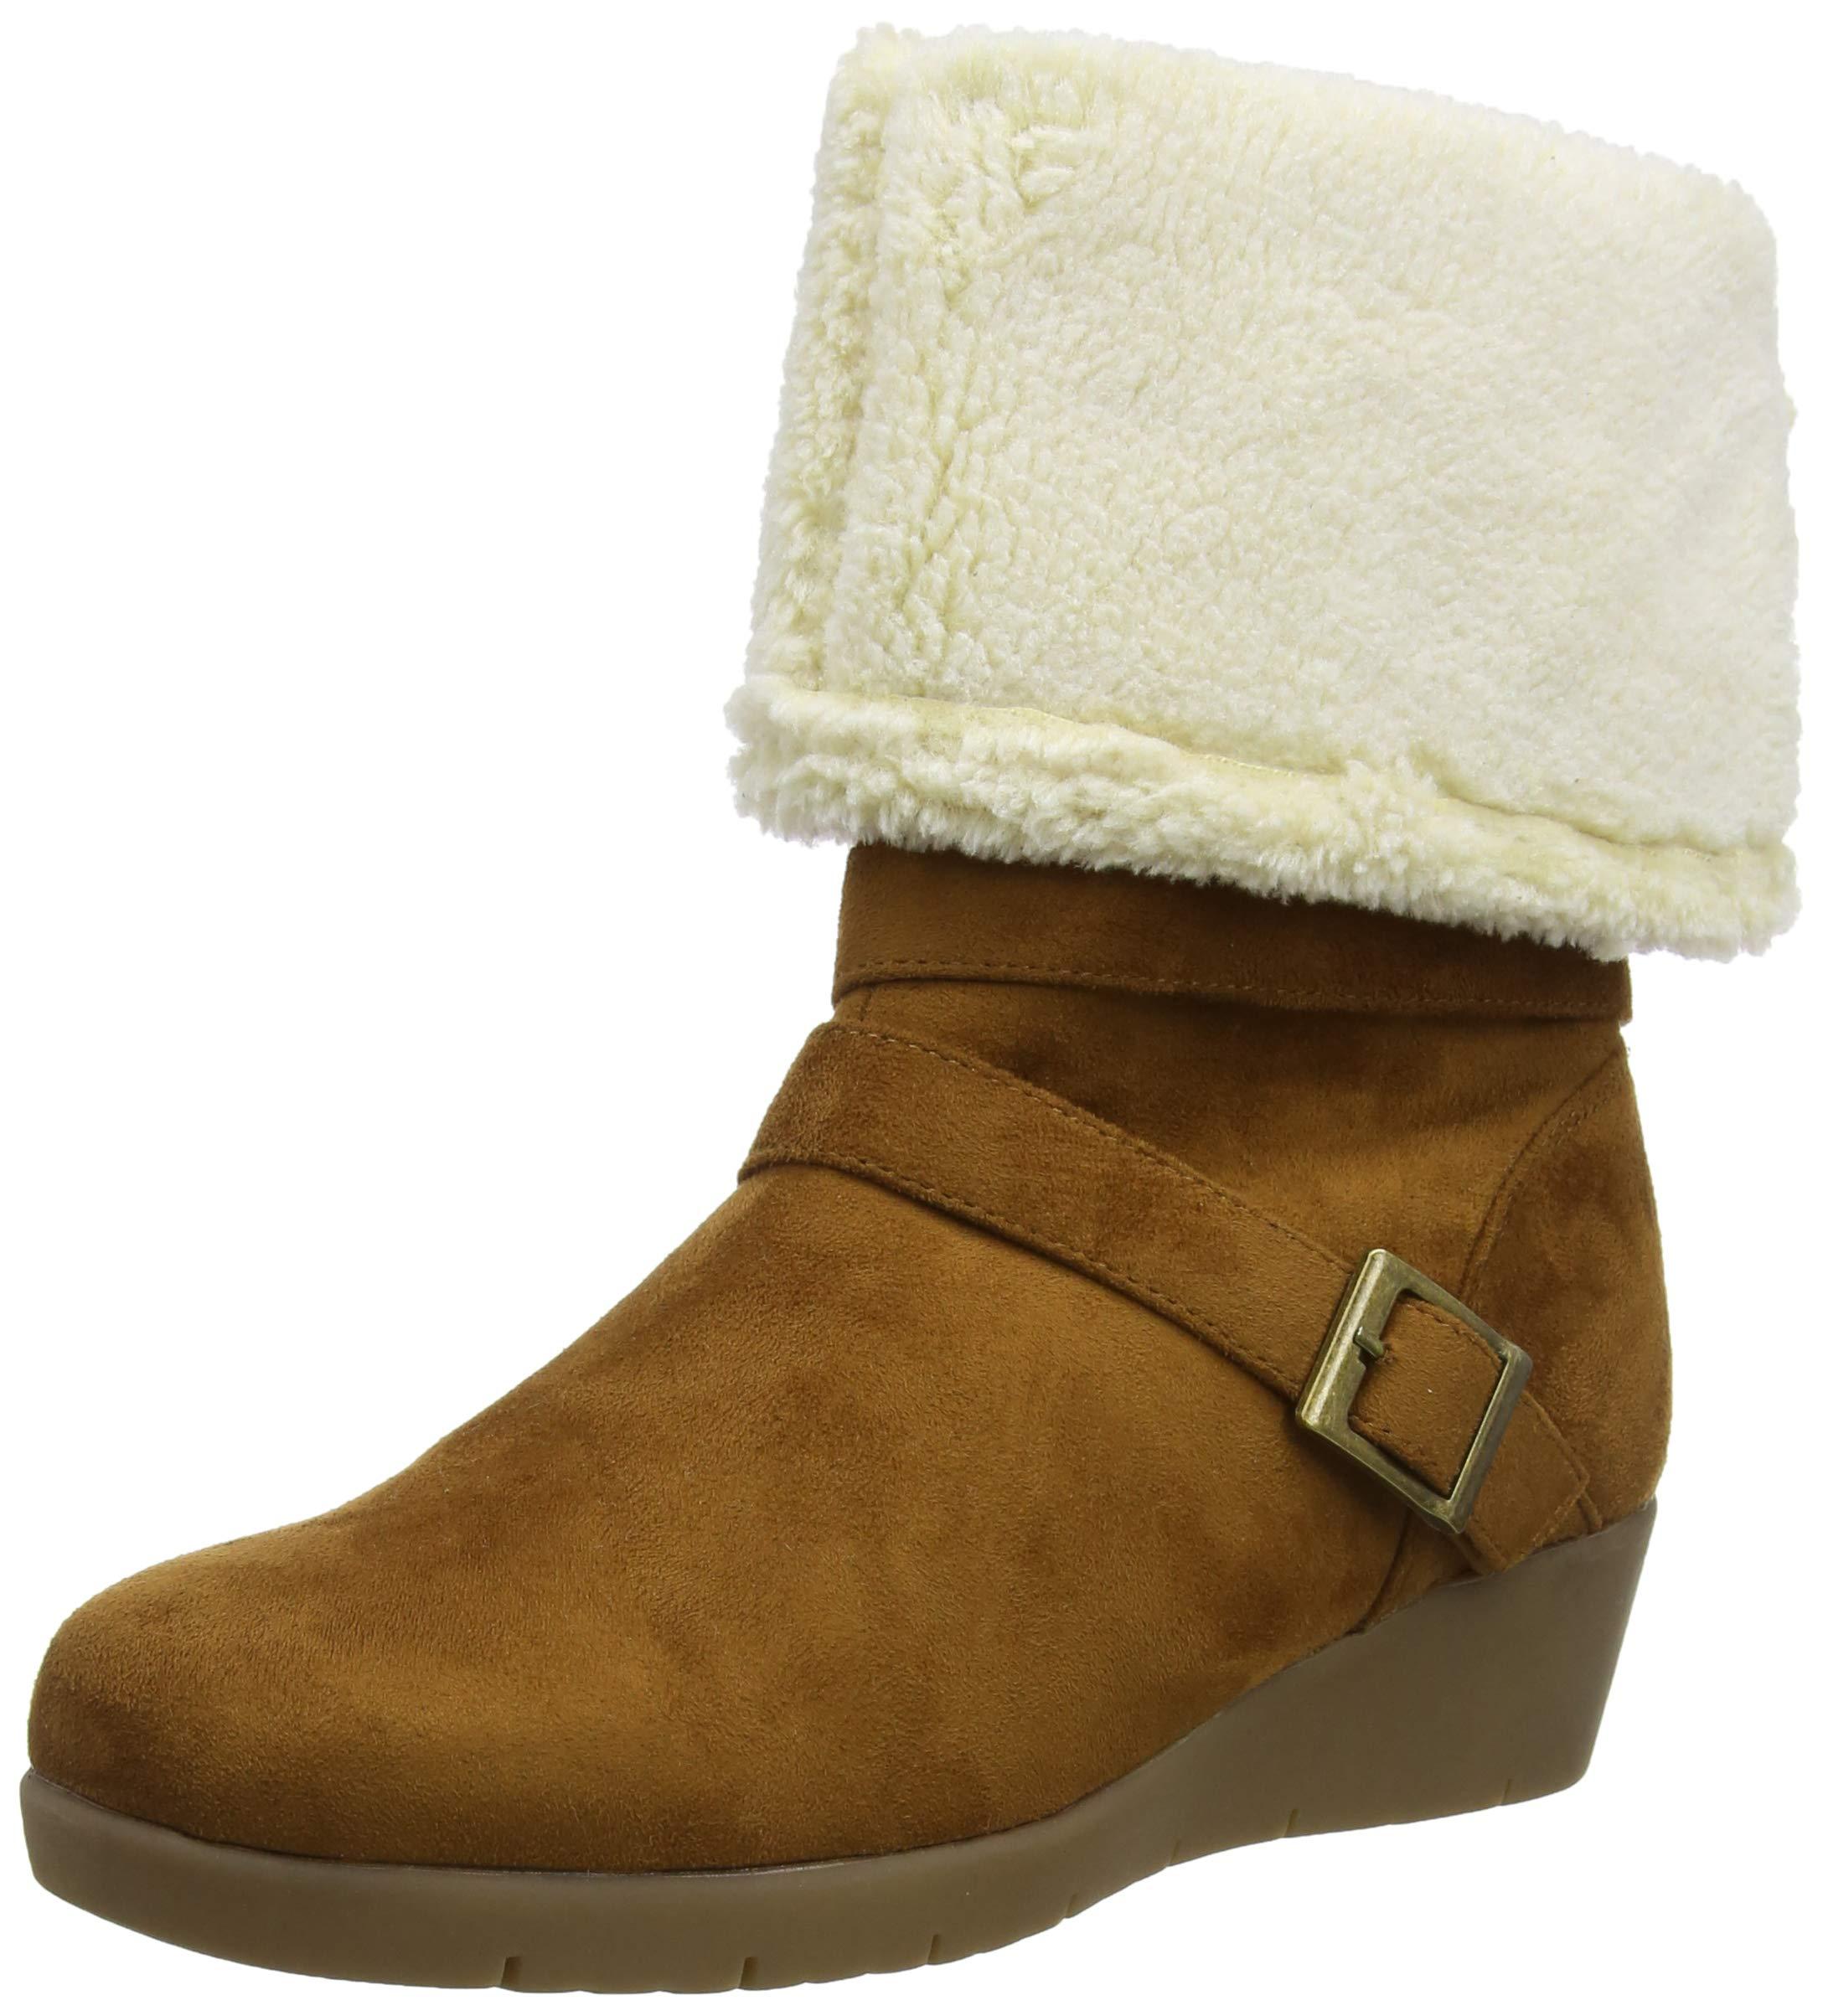 FemmeMarrontan Cosy Wedge Joe And Cute BootsBottes Eu A41 Browns SGLMVUqzp